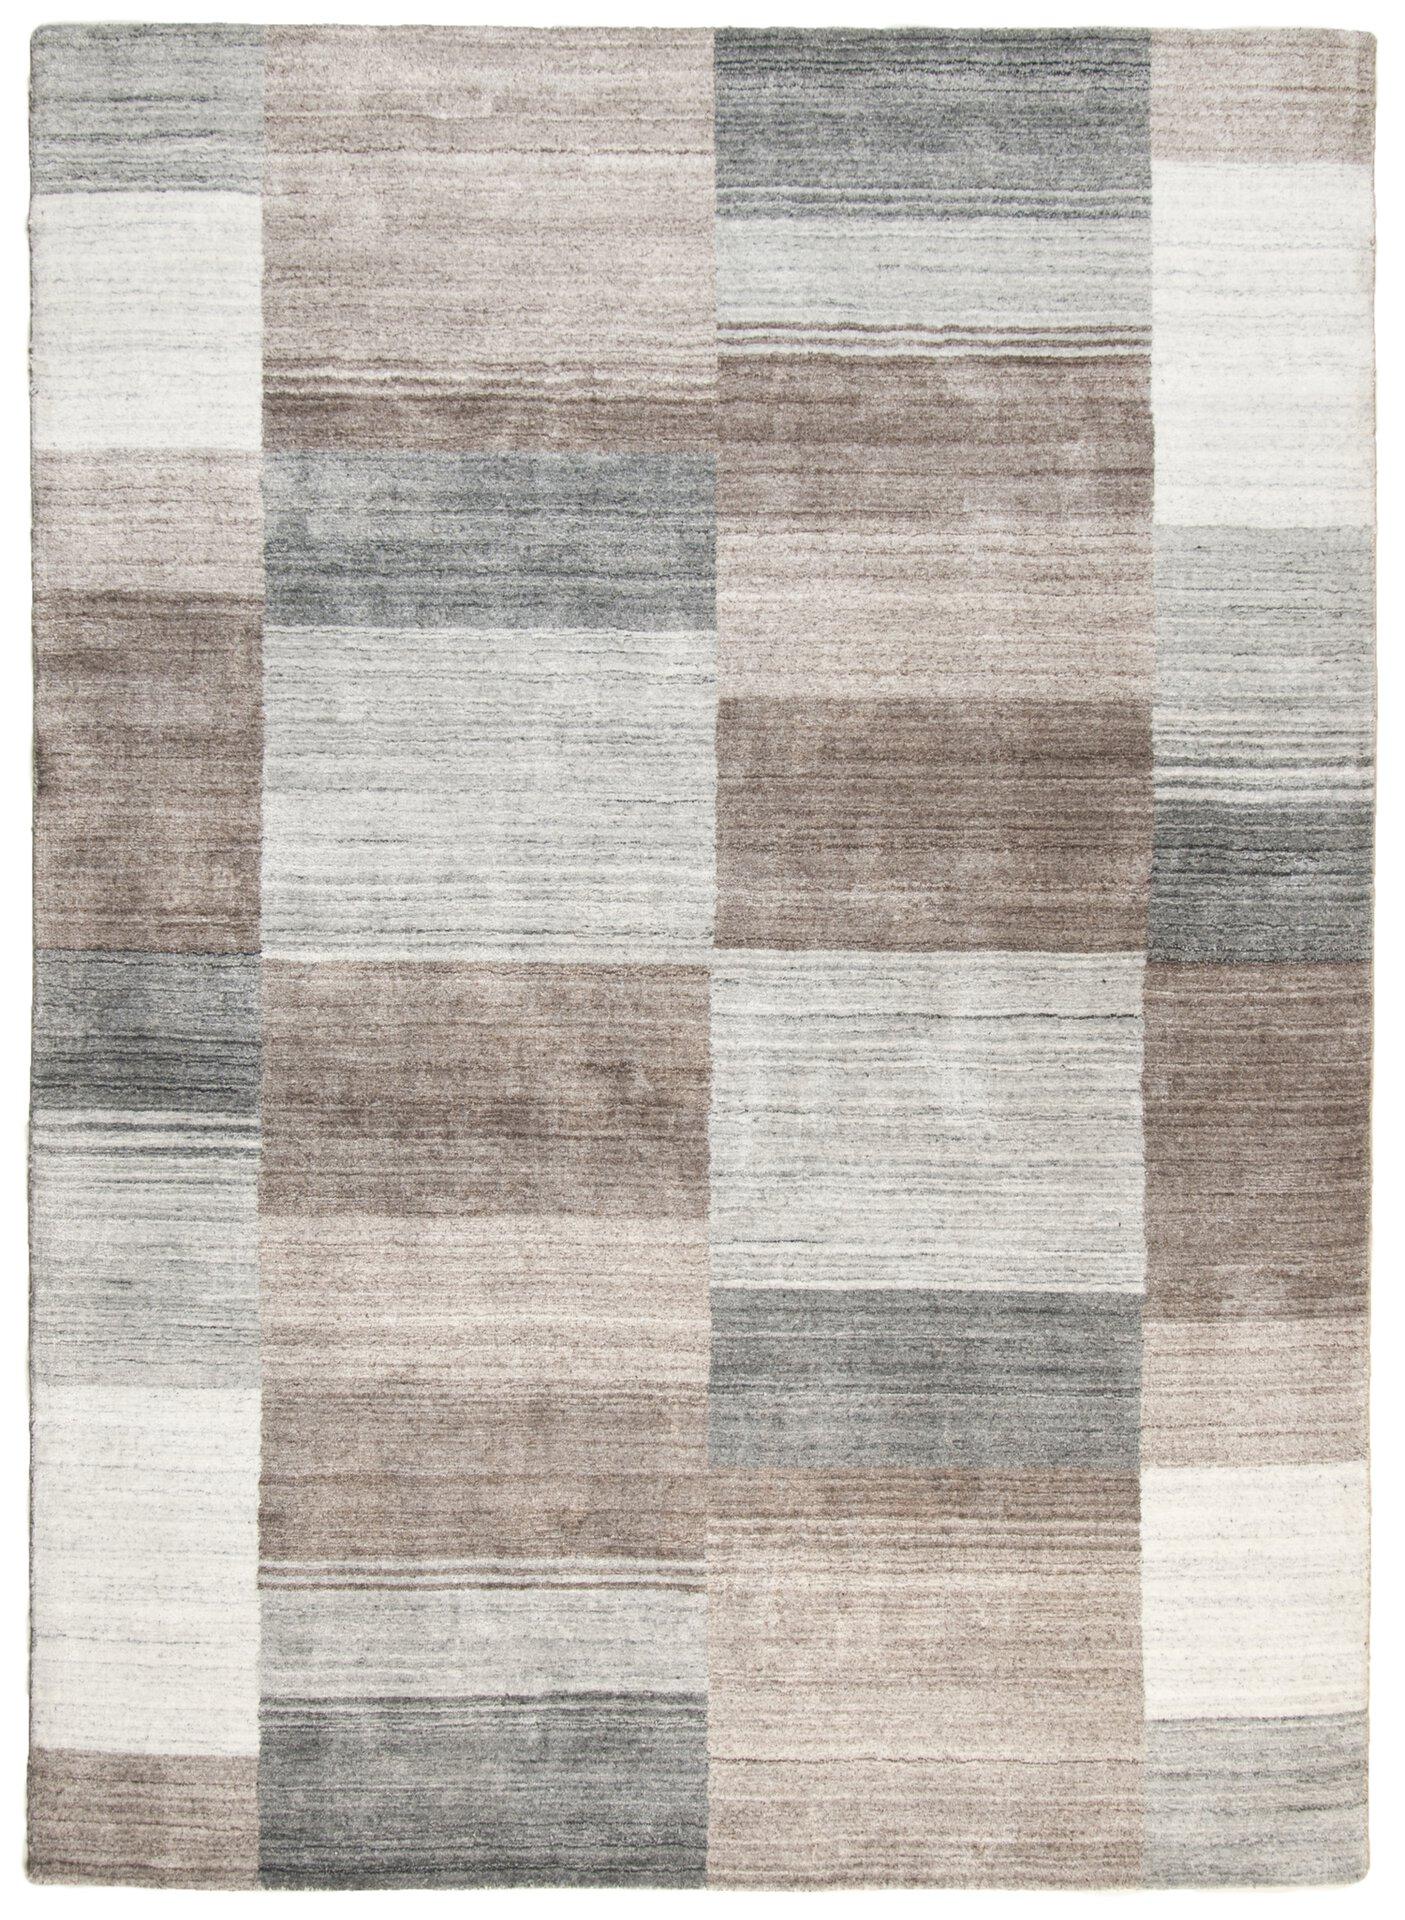 Handwebteppich Venice Theko Textil grau 1 cm